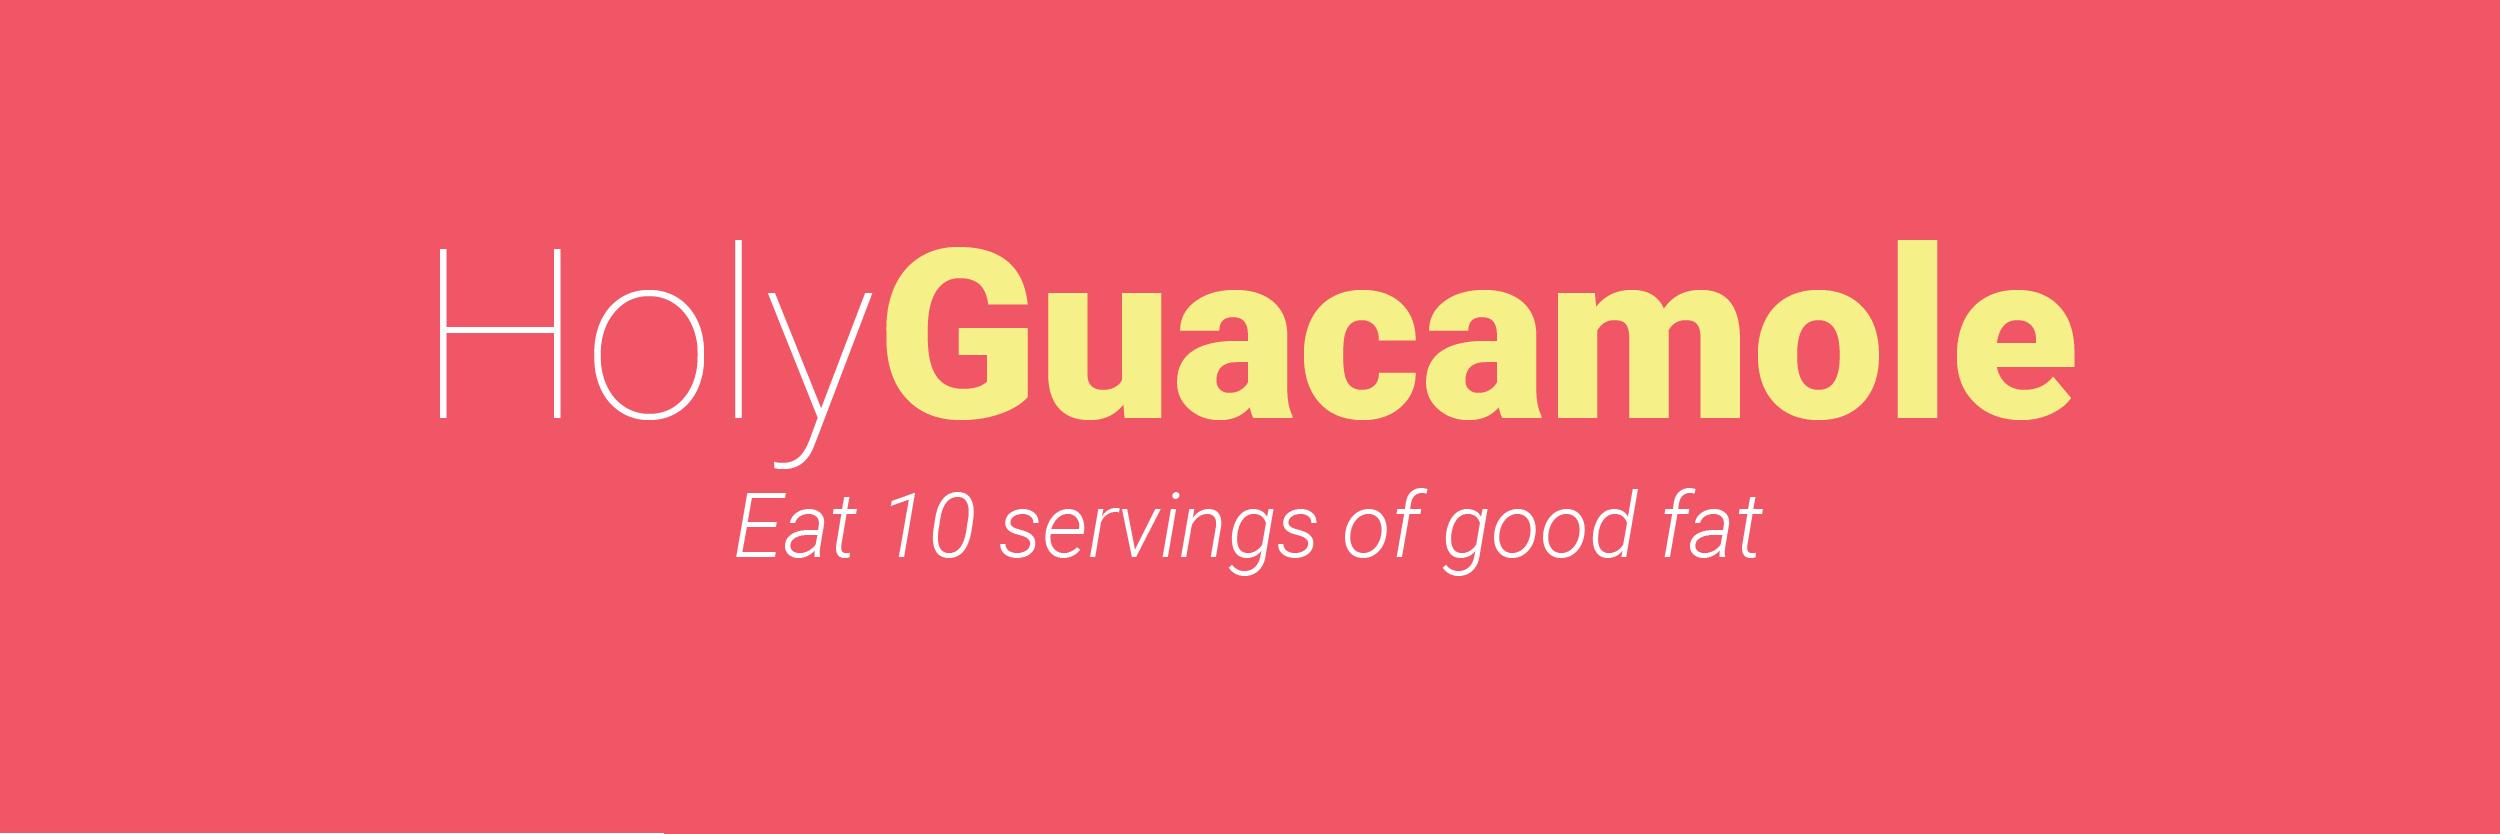 Holy Guacamole-01